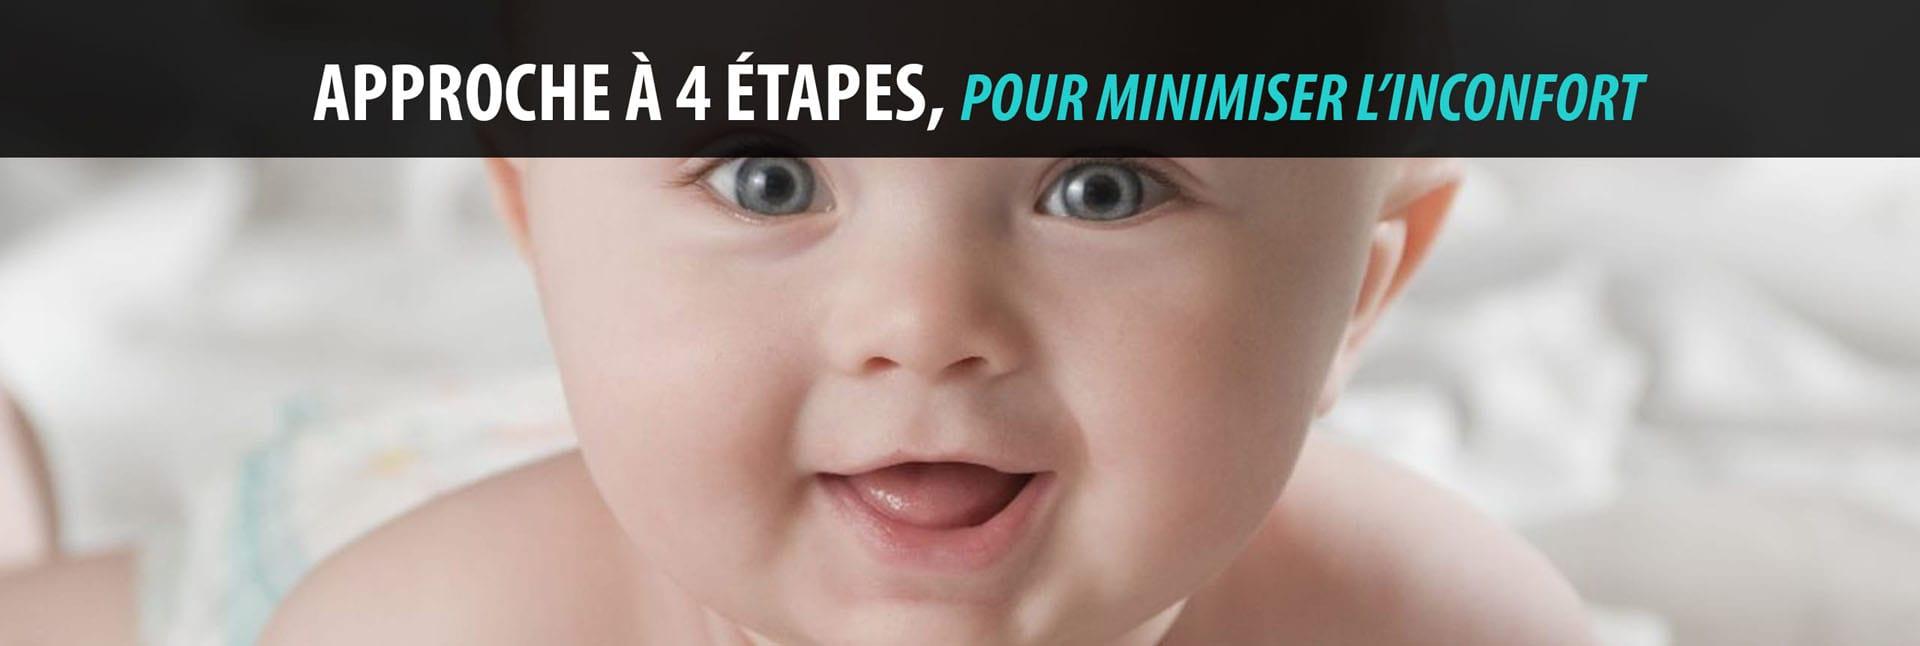 babybannernewx-min-min